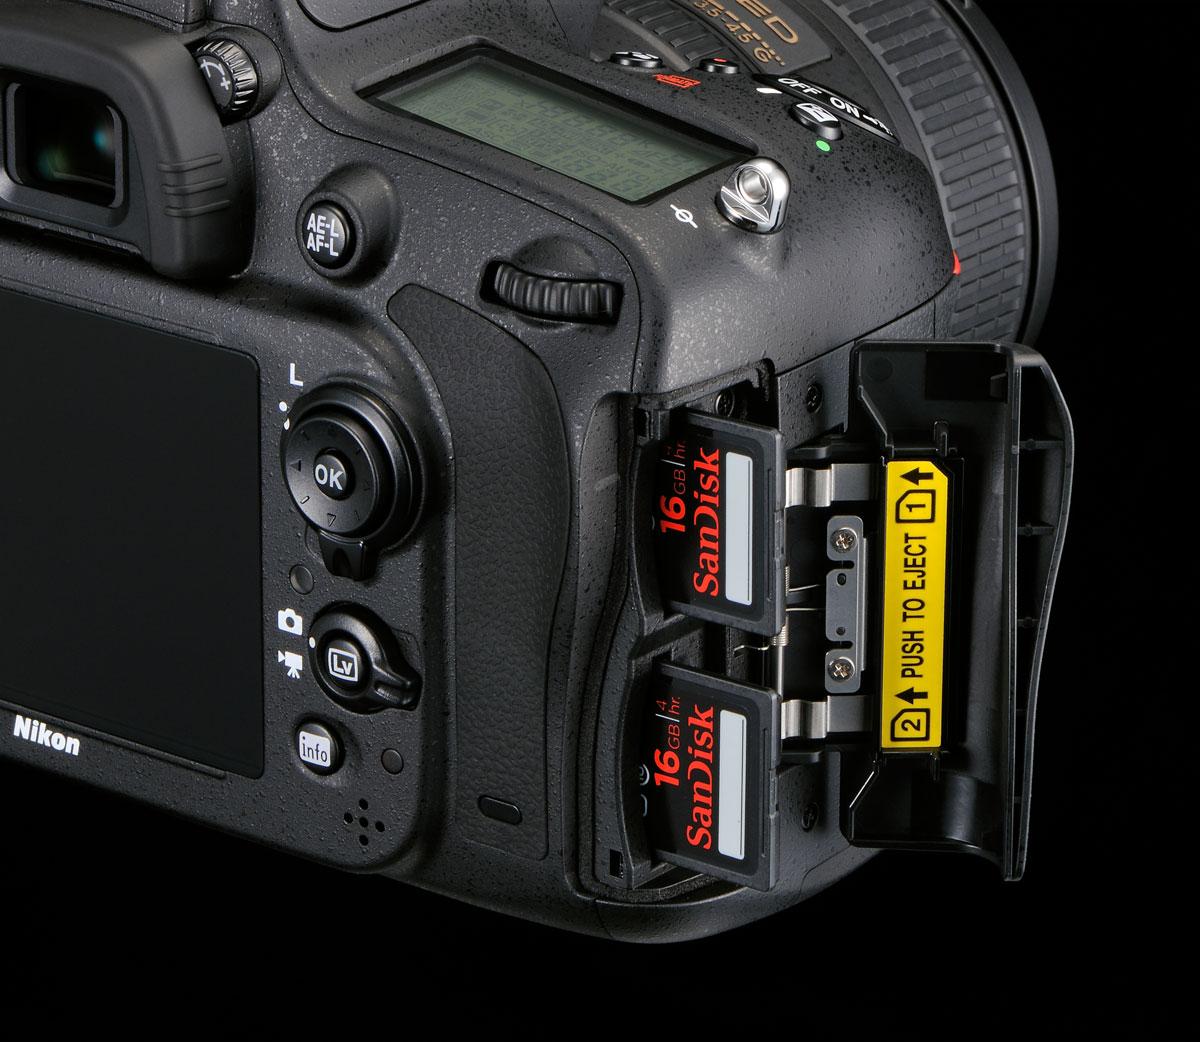 Nikon D610 Kit 24-85 цифровая зеркальная фотокамера